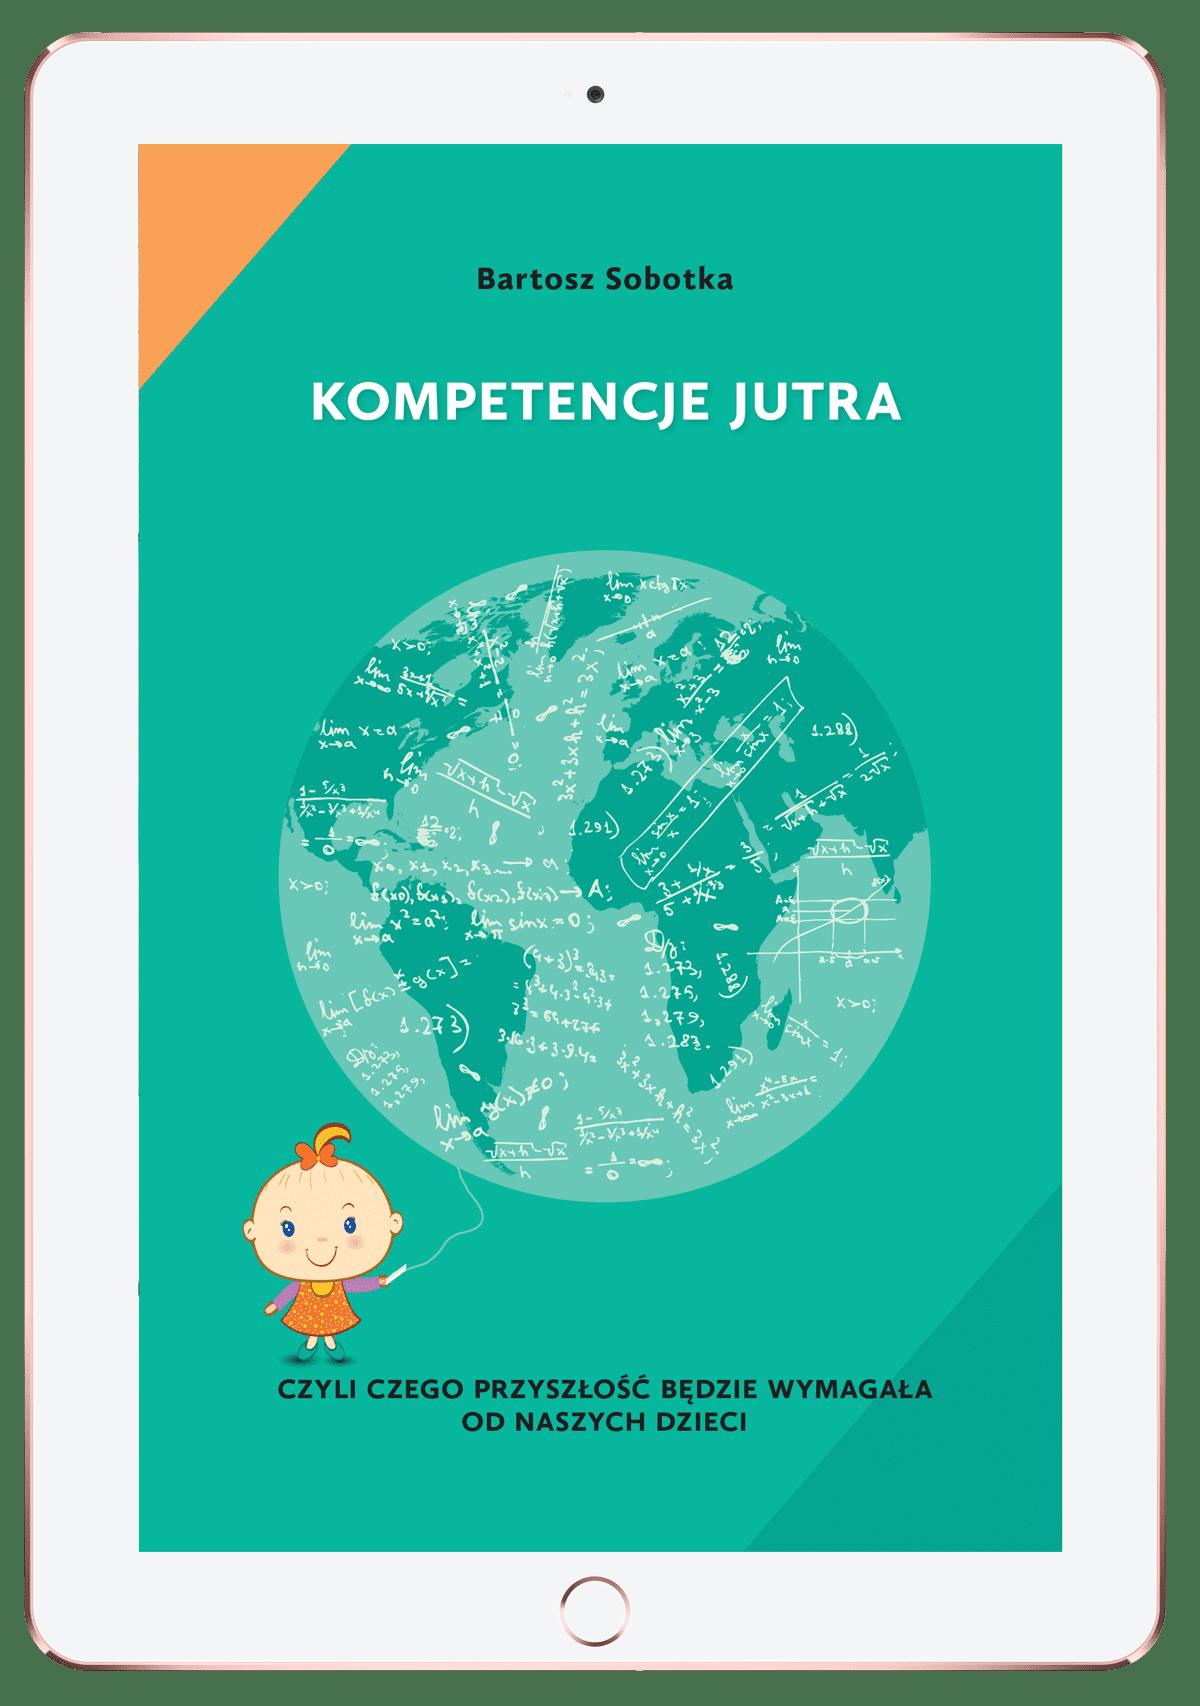 E-book Kompetencje jutra Bartosz Sobotka